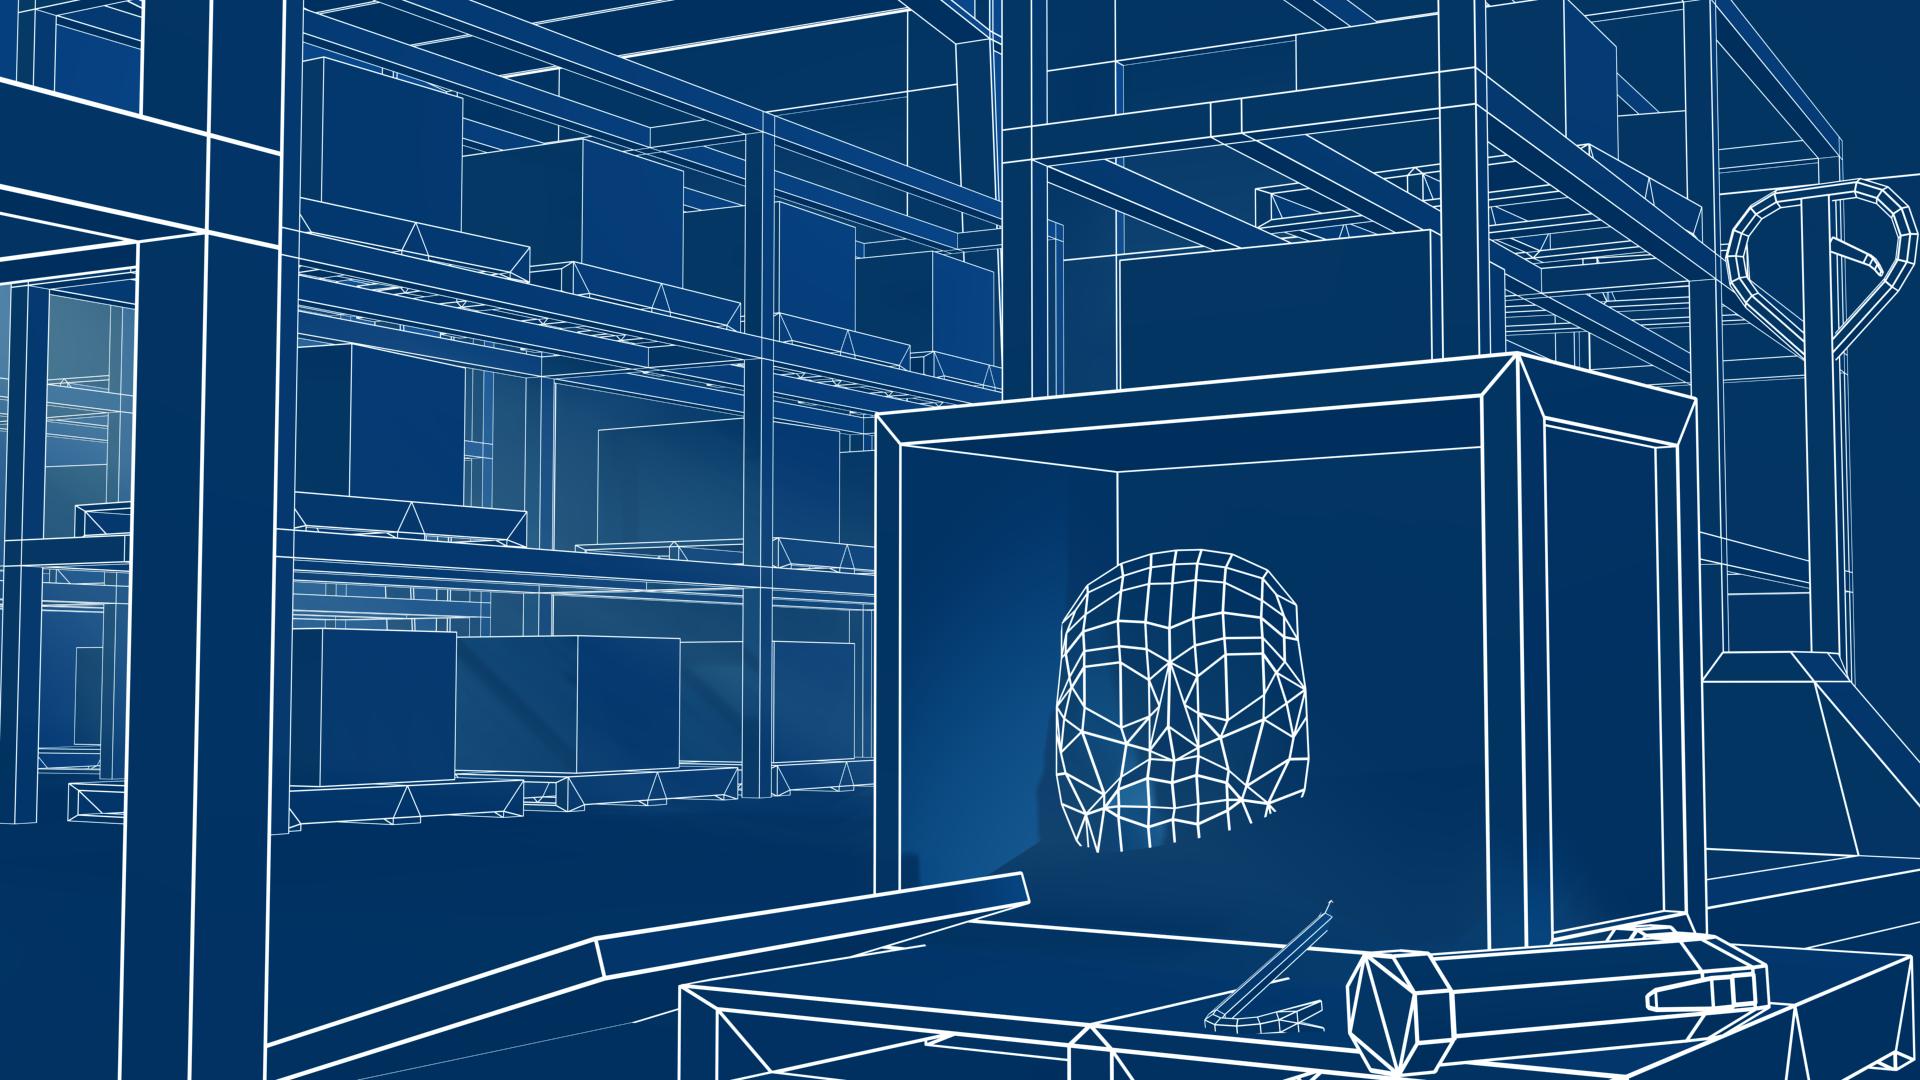 Warehouse gameitect blueprint render artifact warehouse malvernweather Choice Image